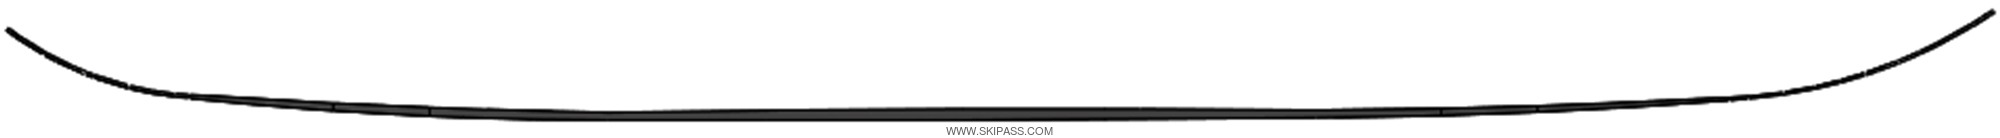 Zag S112